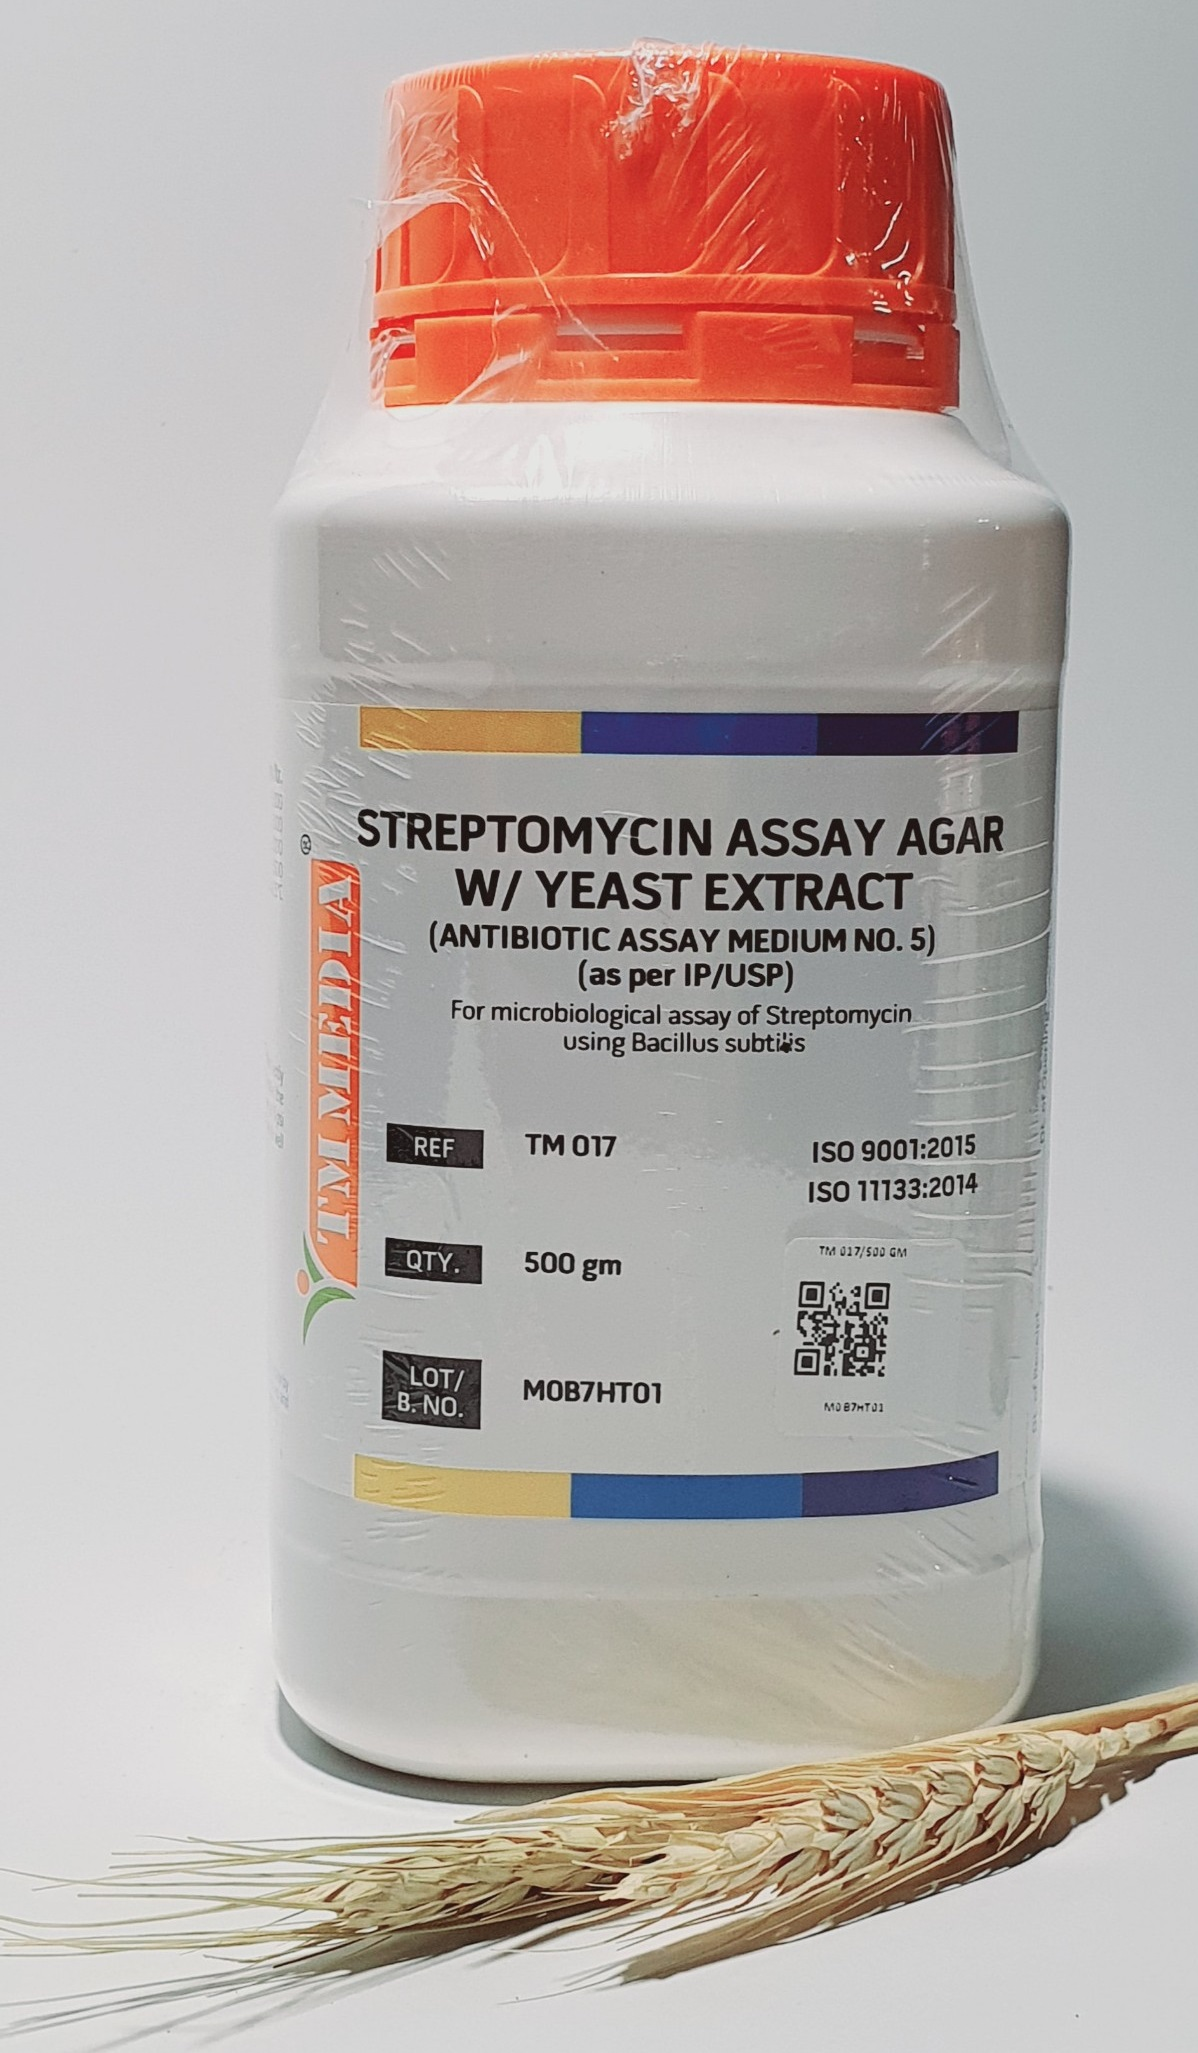 Antibiotic Assay Medium No. 5